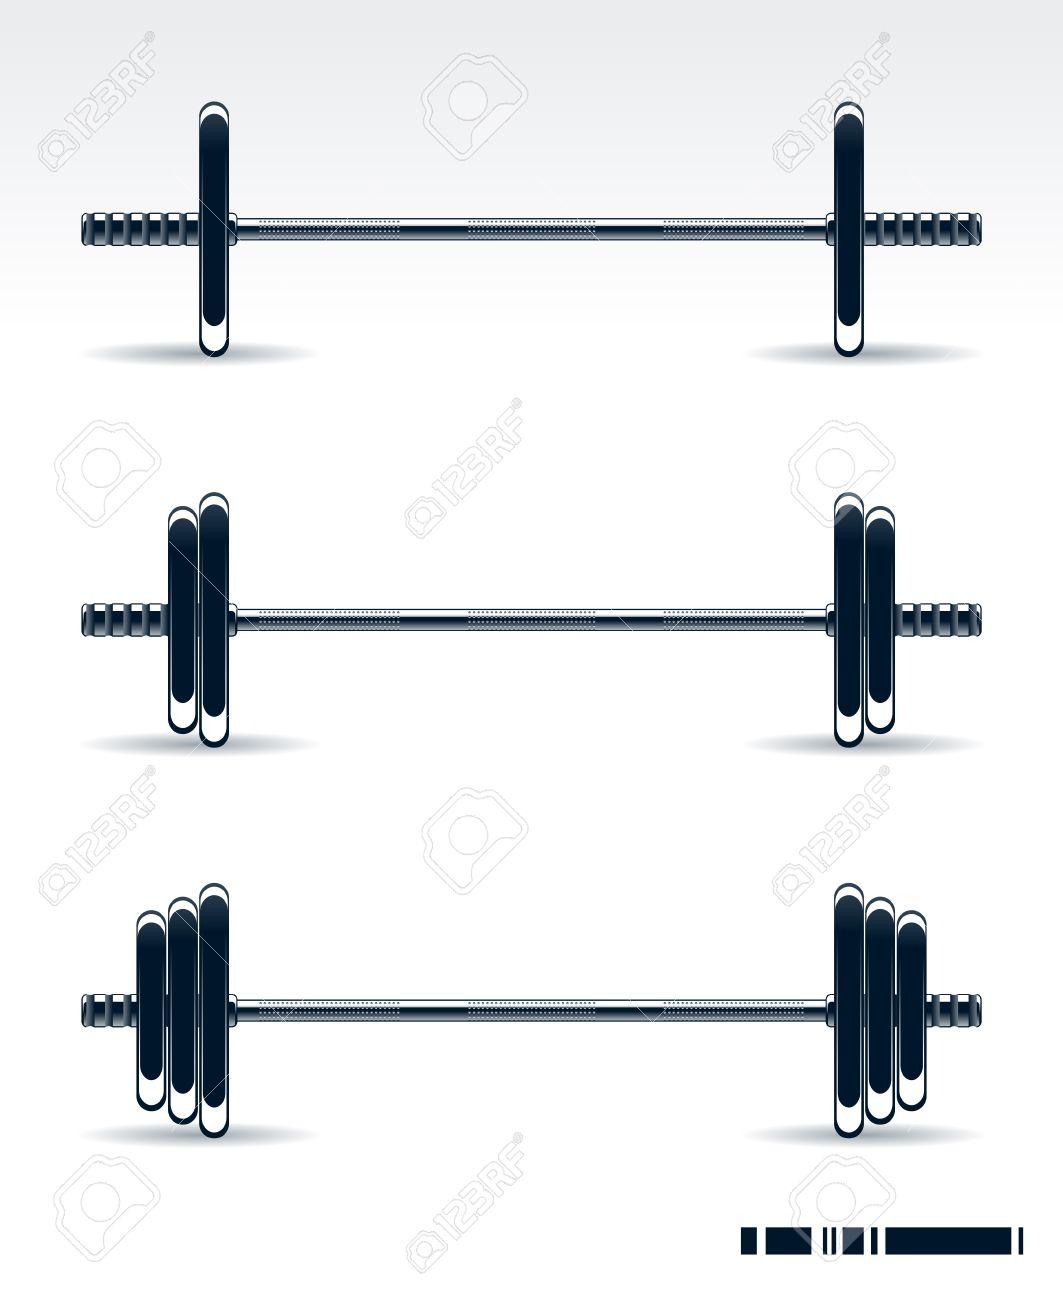 Bodybuilding equipment on white background Stock Vector - 6189062